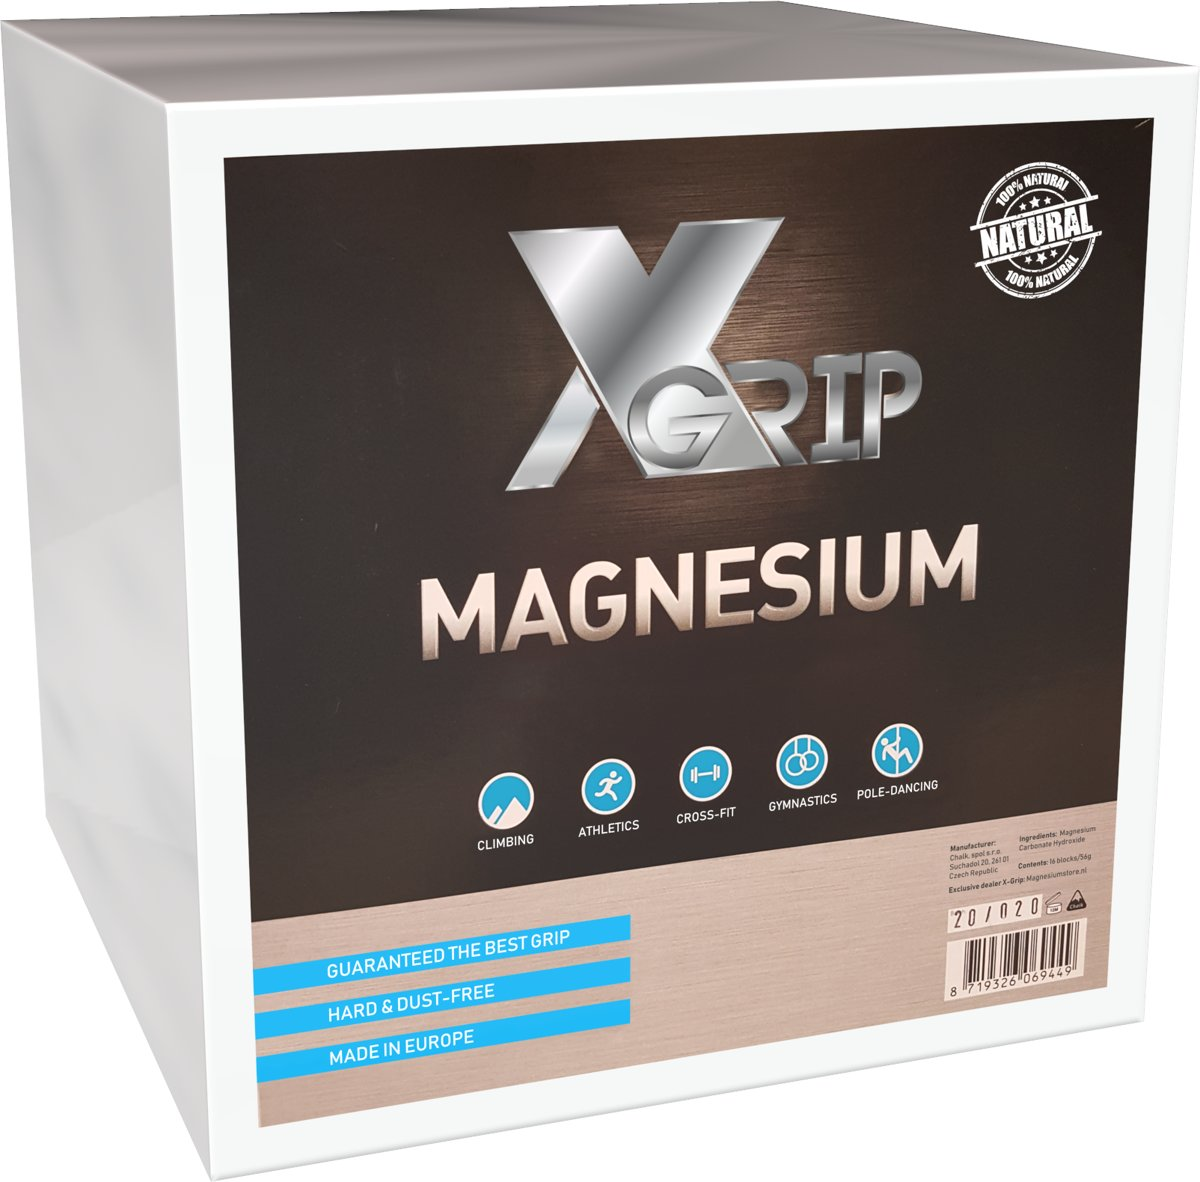 XGRIP MAGNESIUM BOX  4 Doosjes, 64 blokjes ( turnen,klimmen,sport)